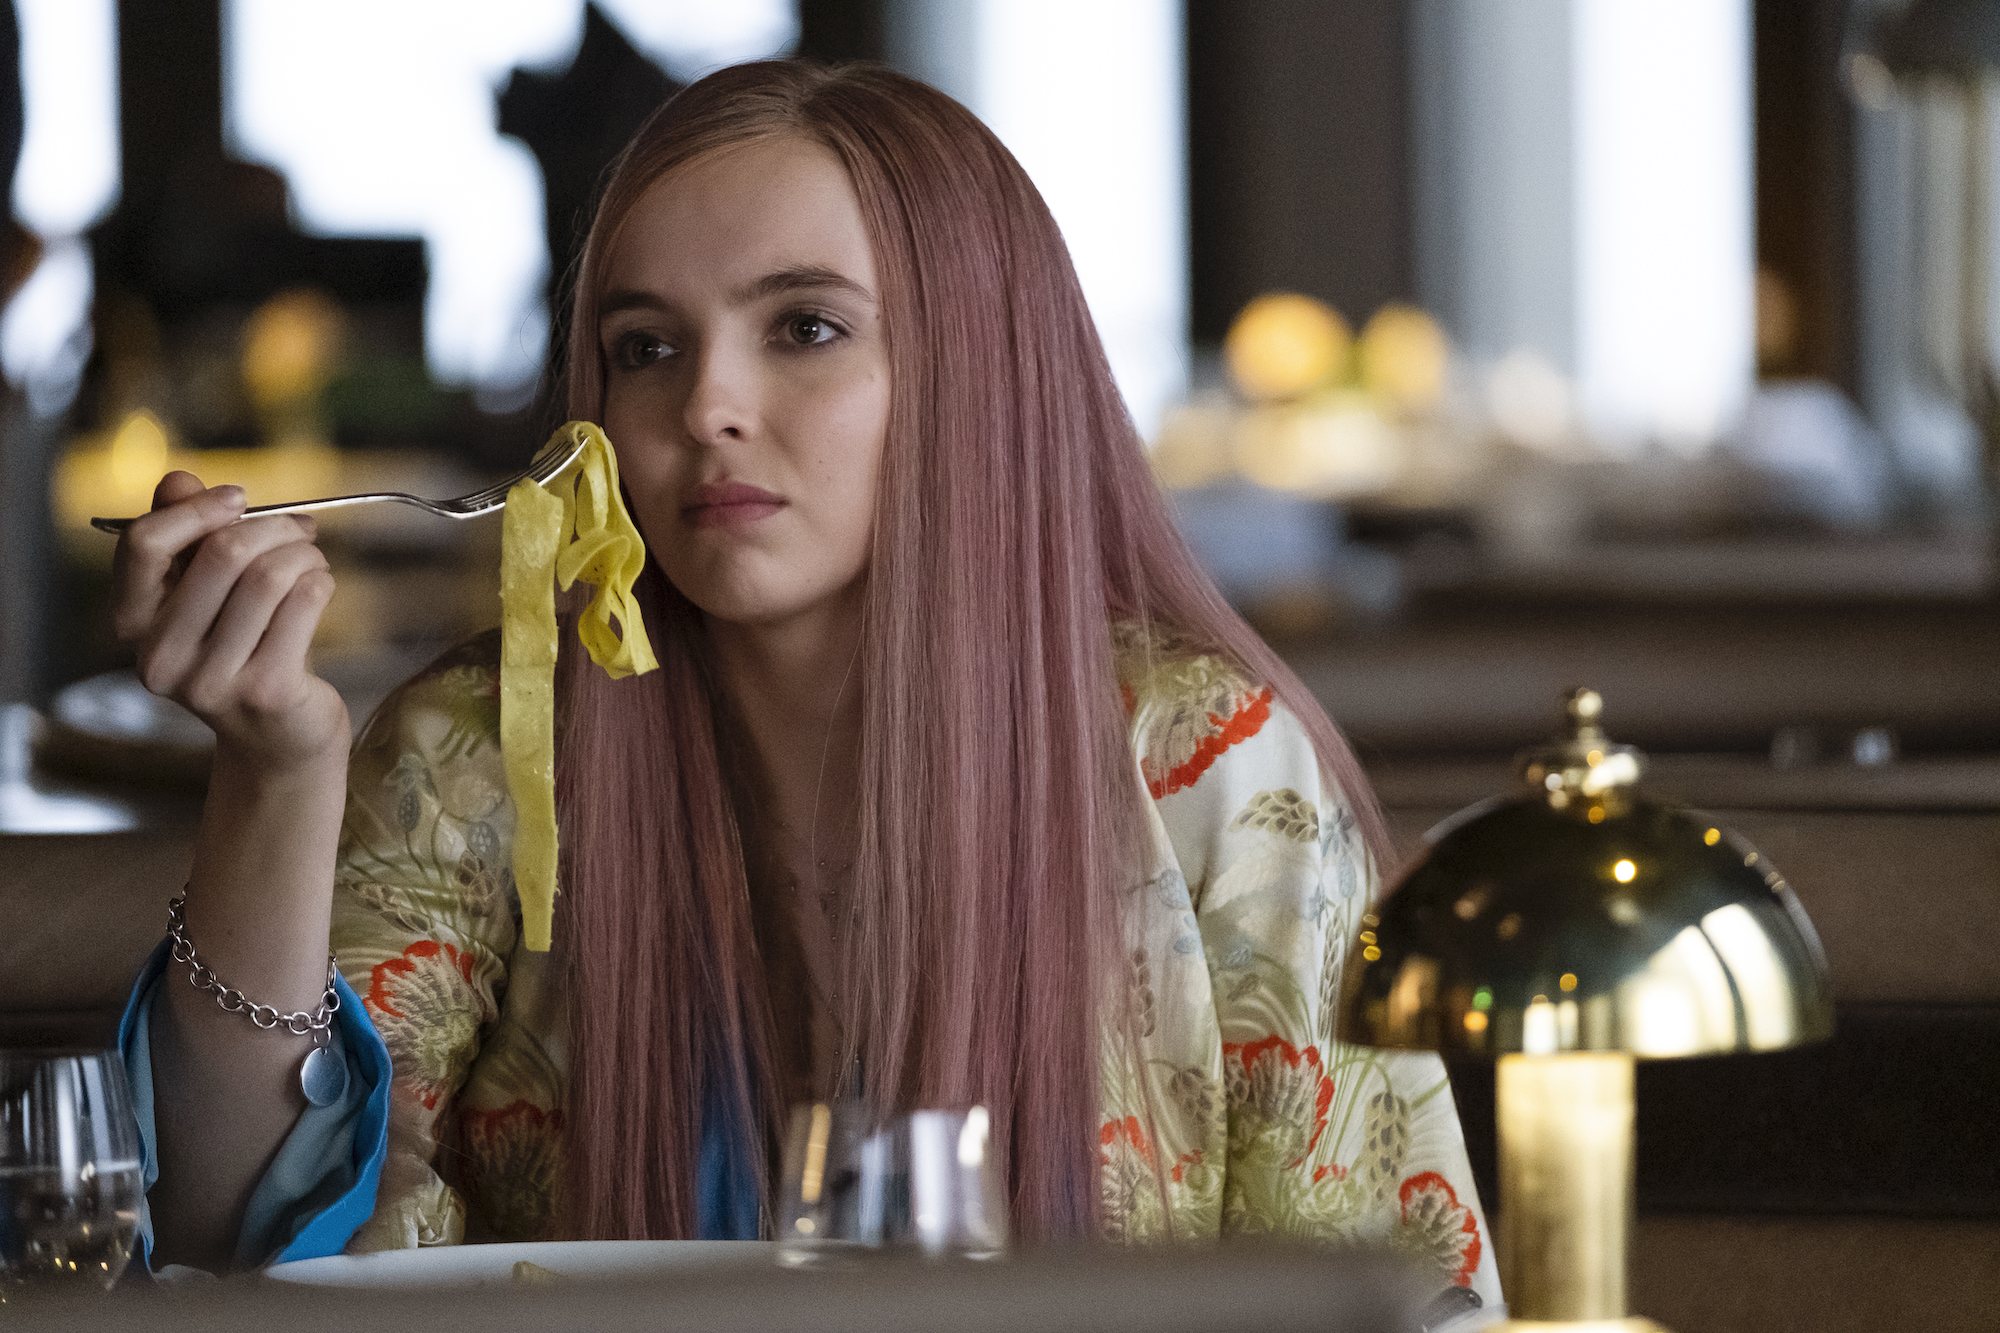 Jodie Comer as Villanelle in Season 2, eating pasta.